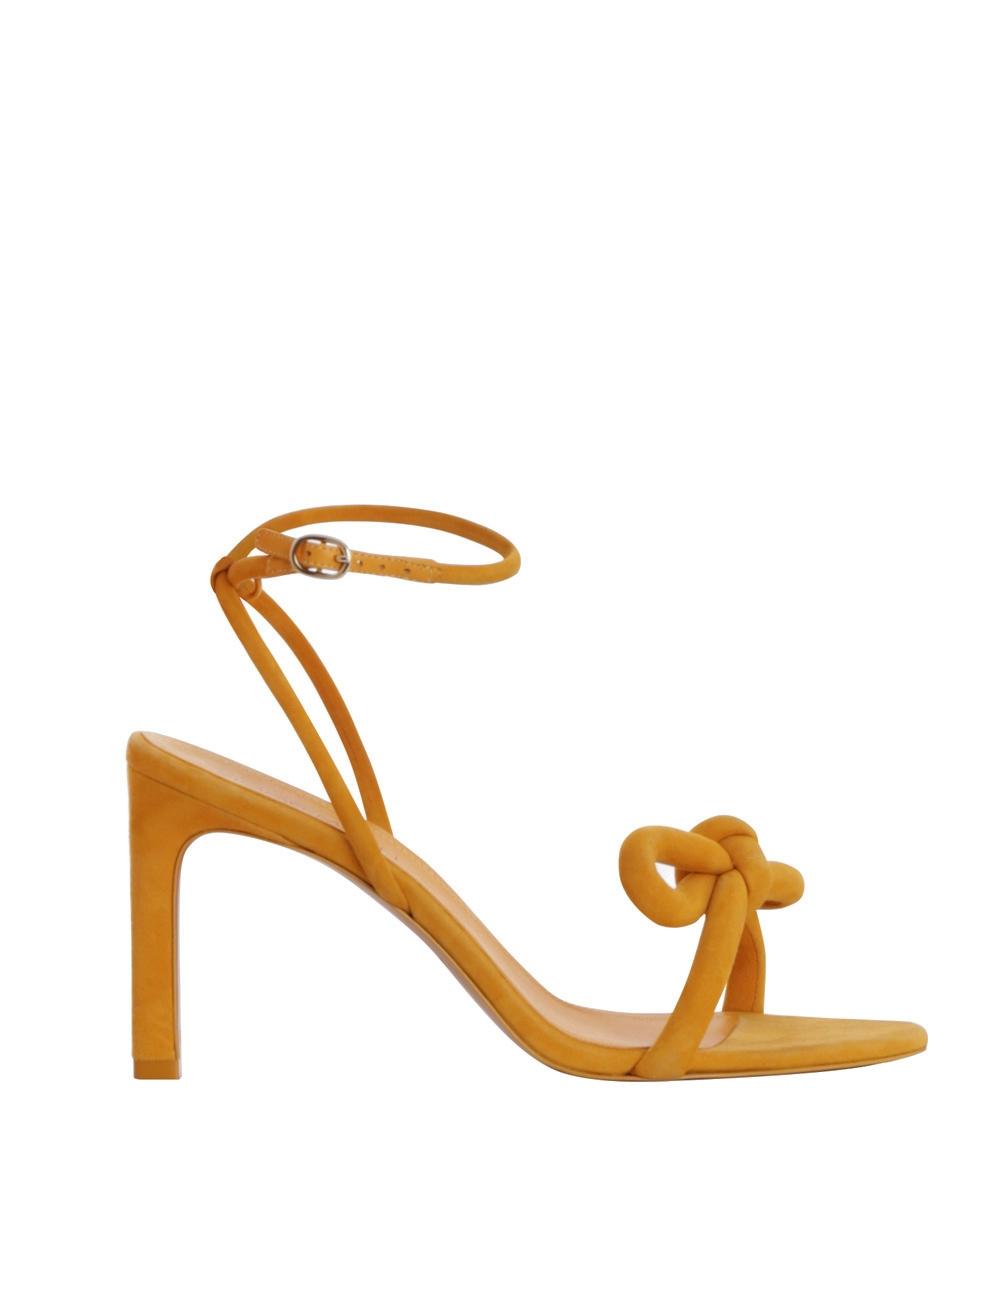 Sculptural Bow Heel